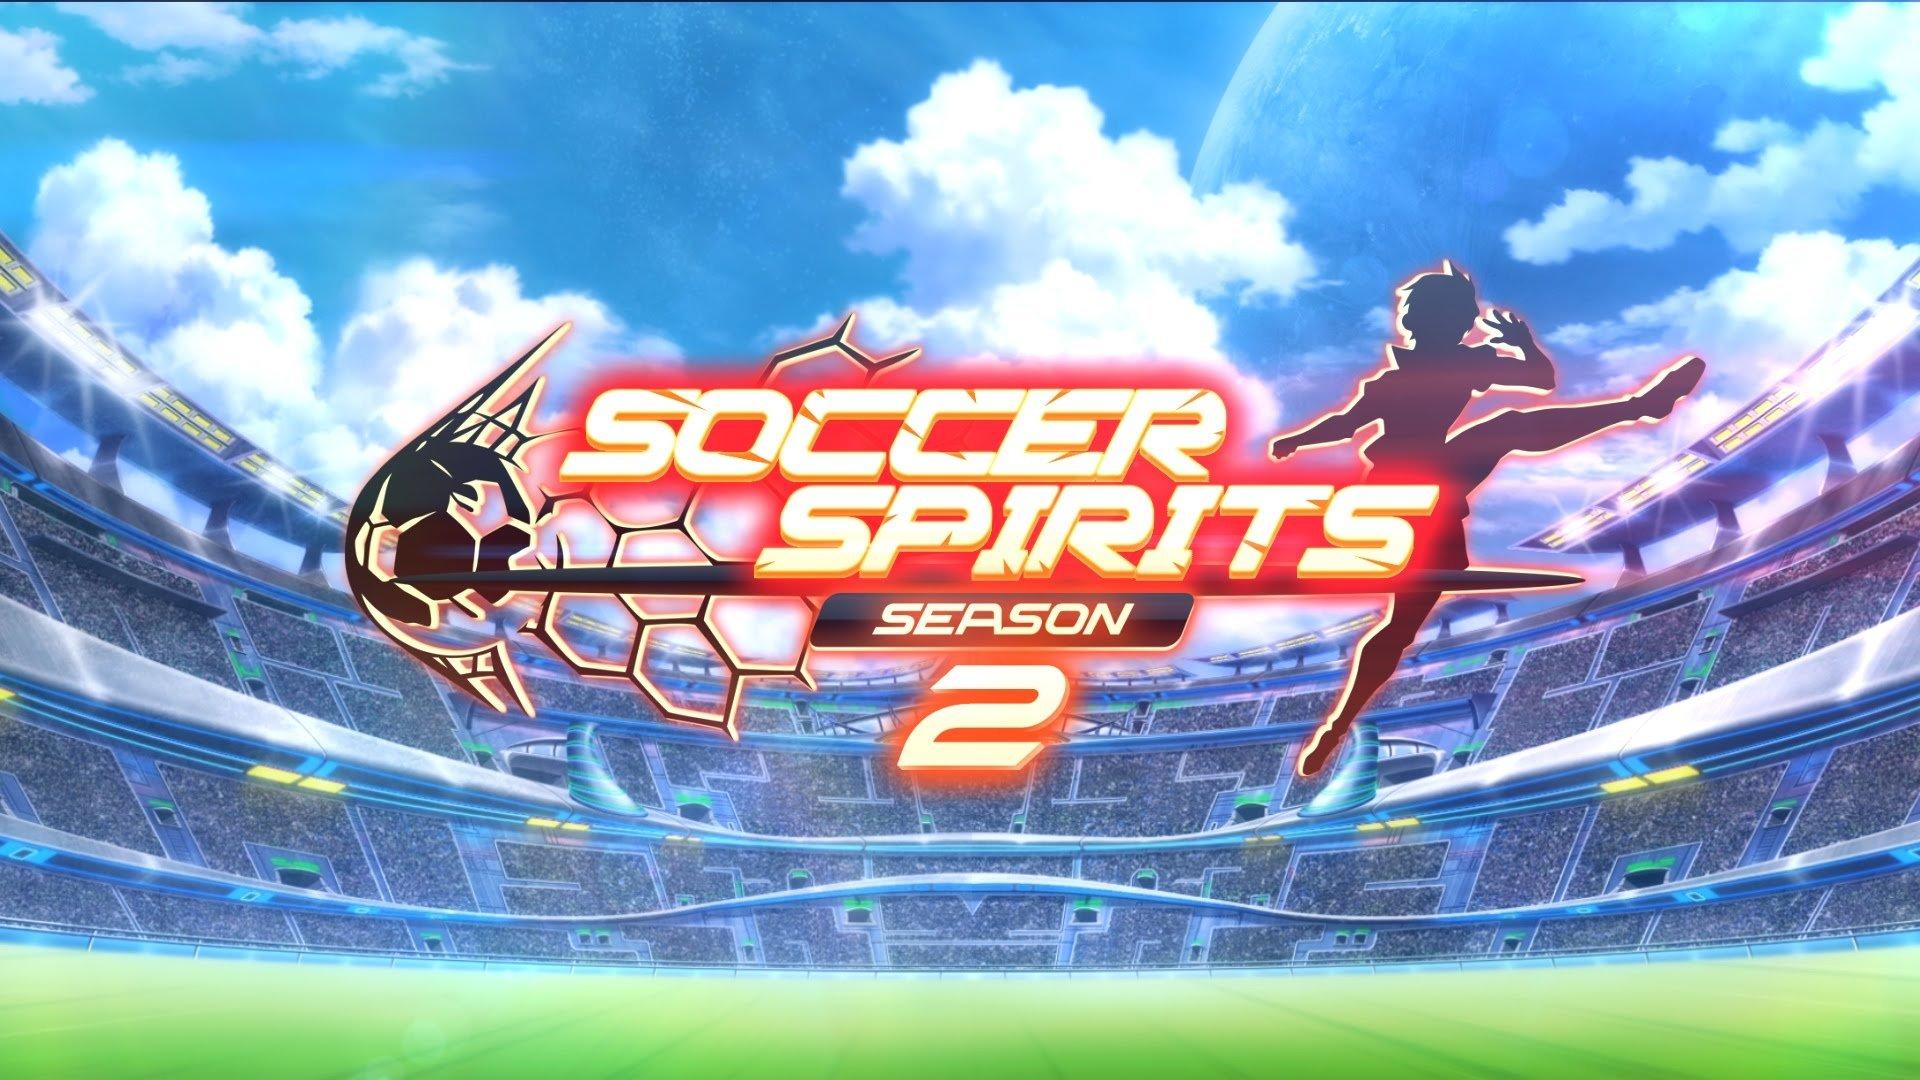 Soccer Spirits Hd Wallpaper Hintergrund 1920x1080 Id